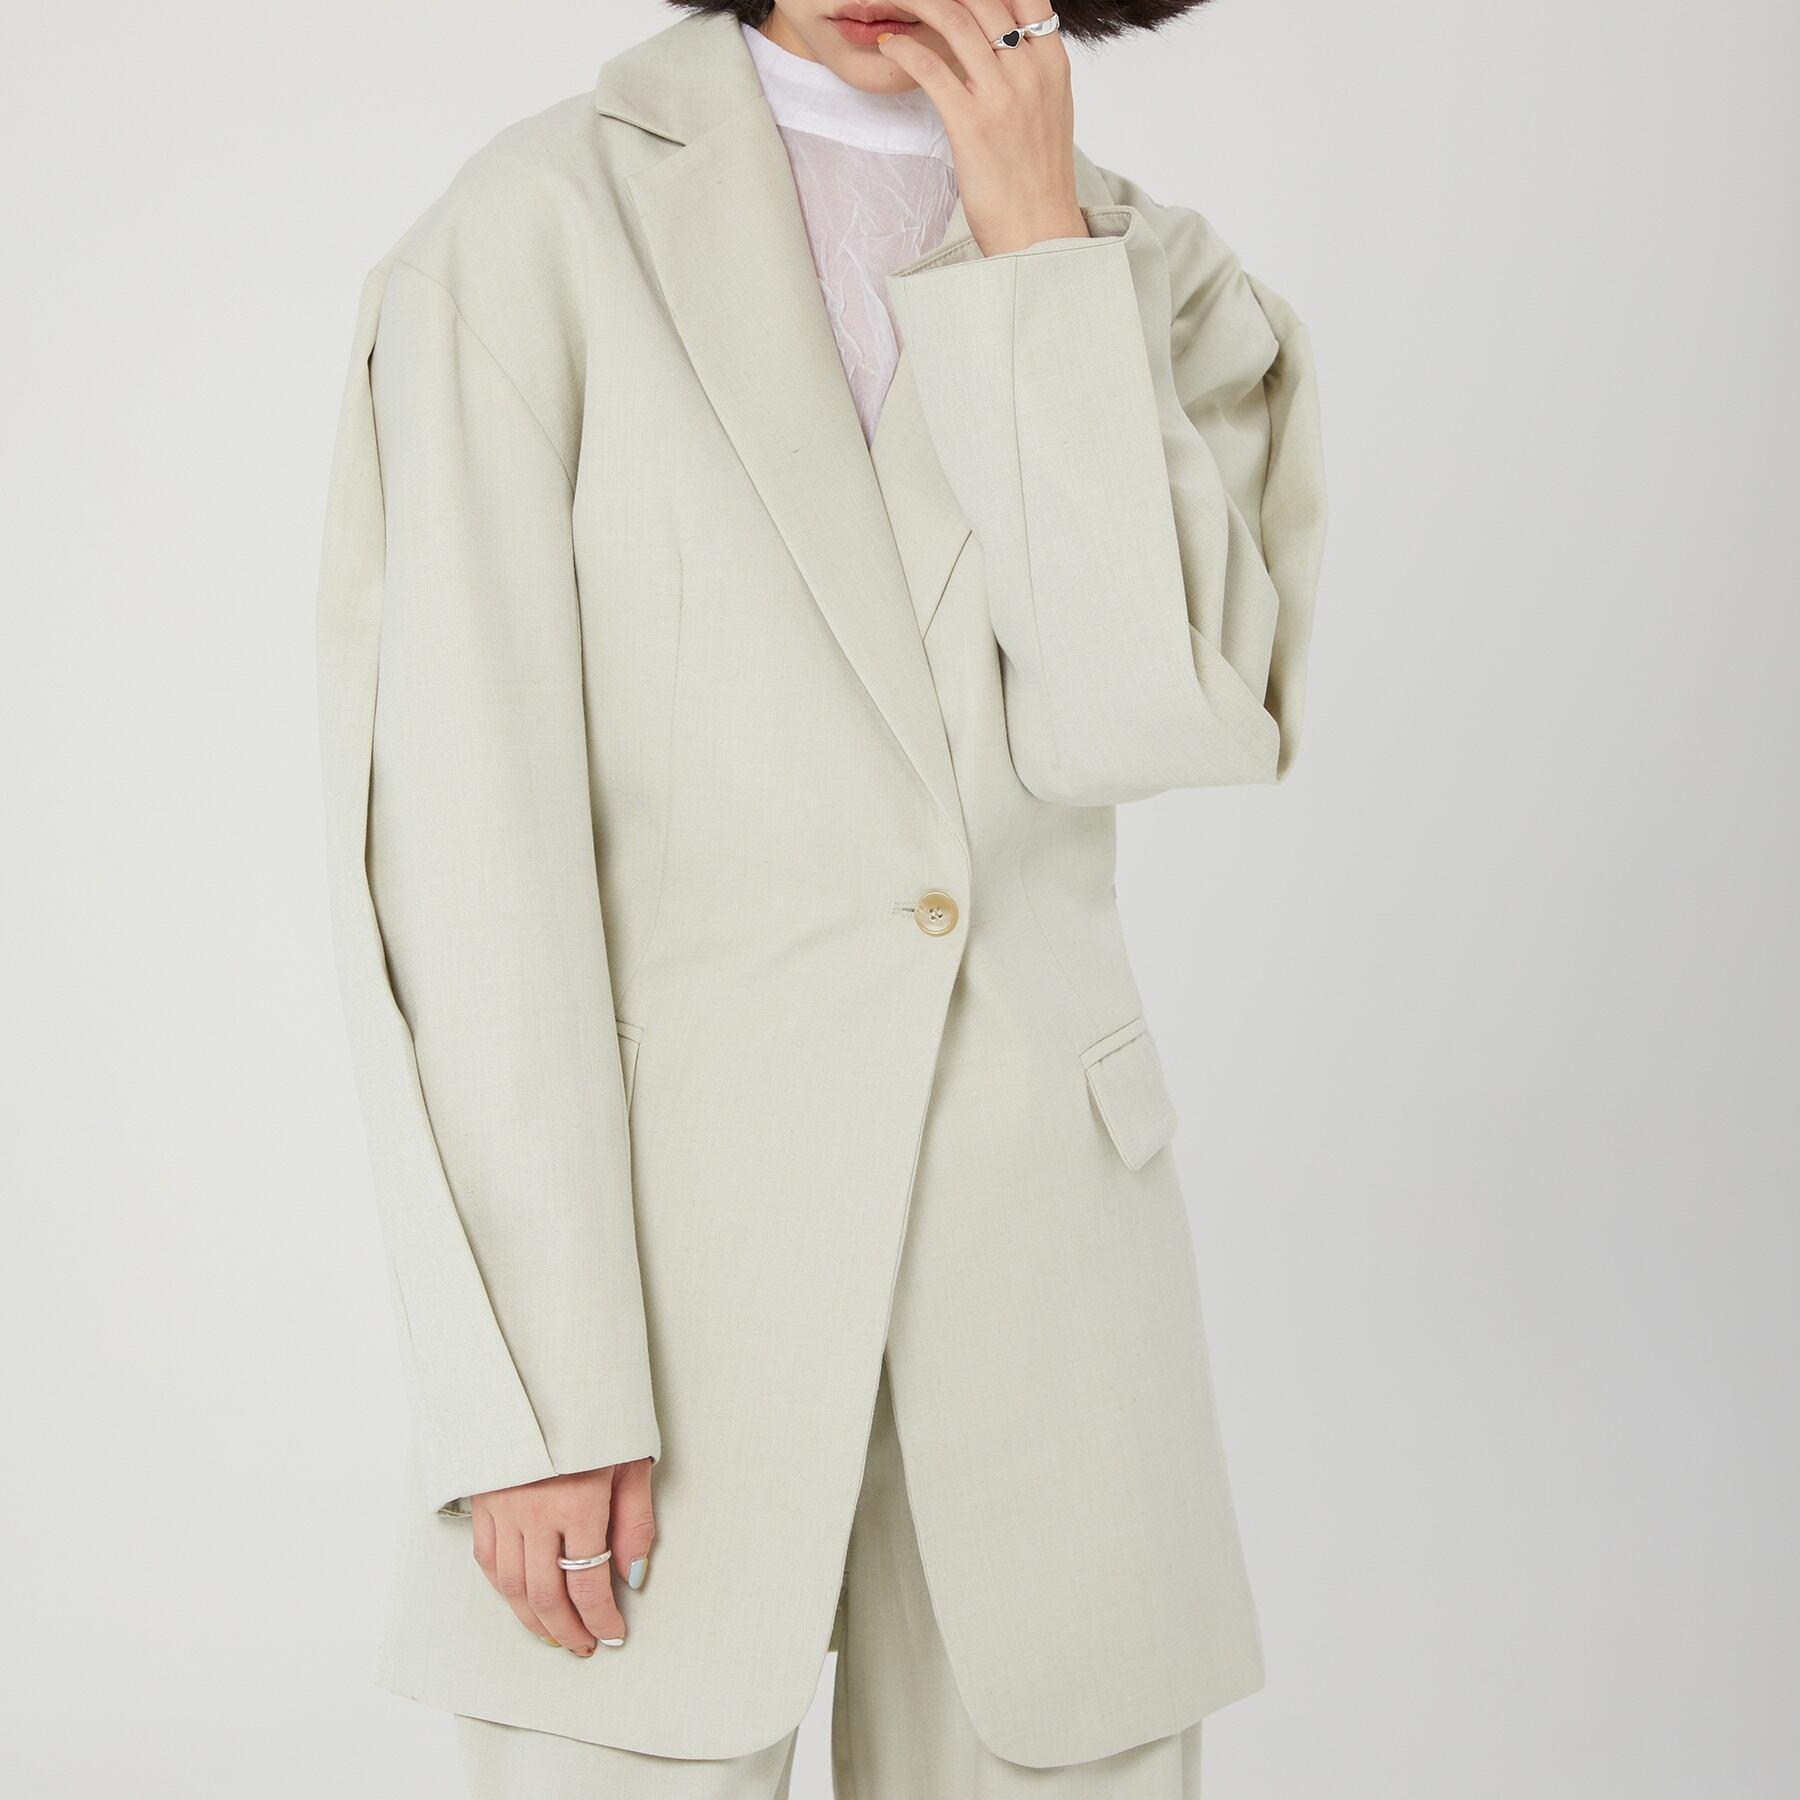 Arm line suit jacket(アームラインスーツジャケット)b-067